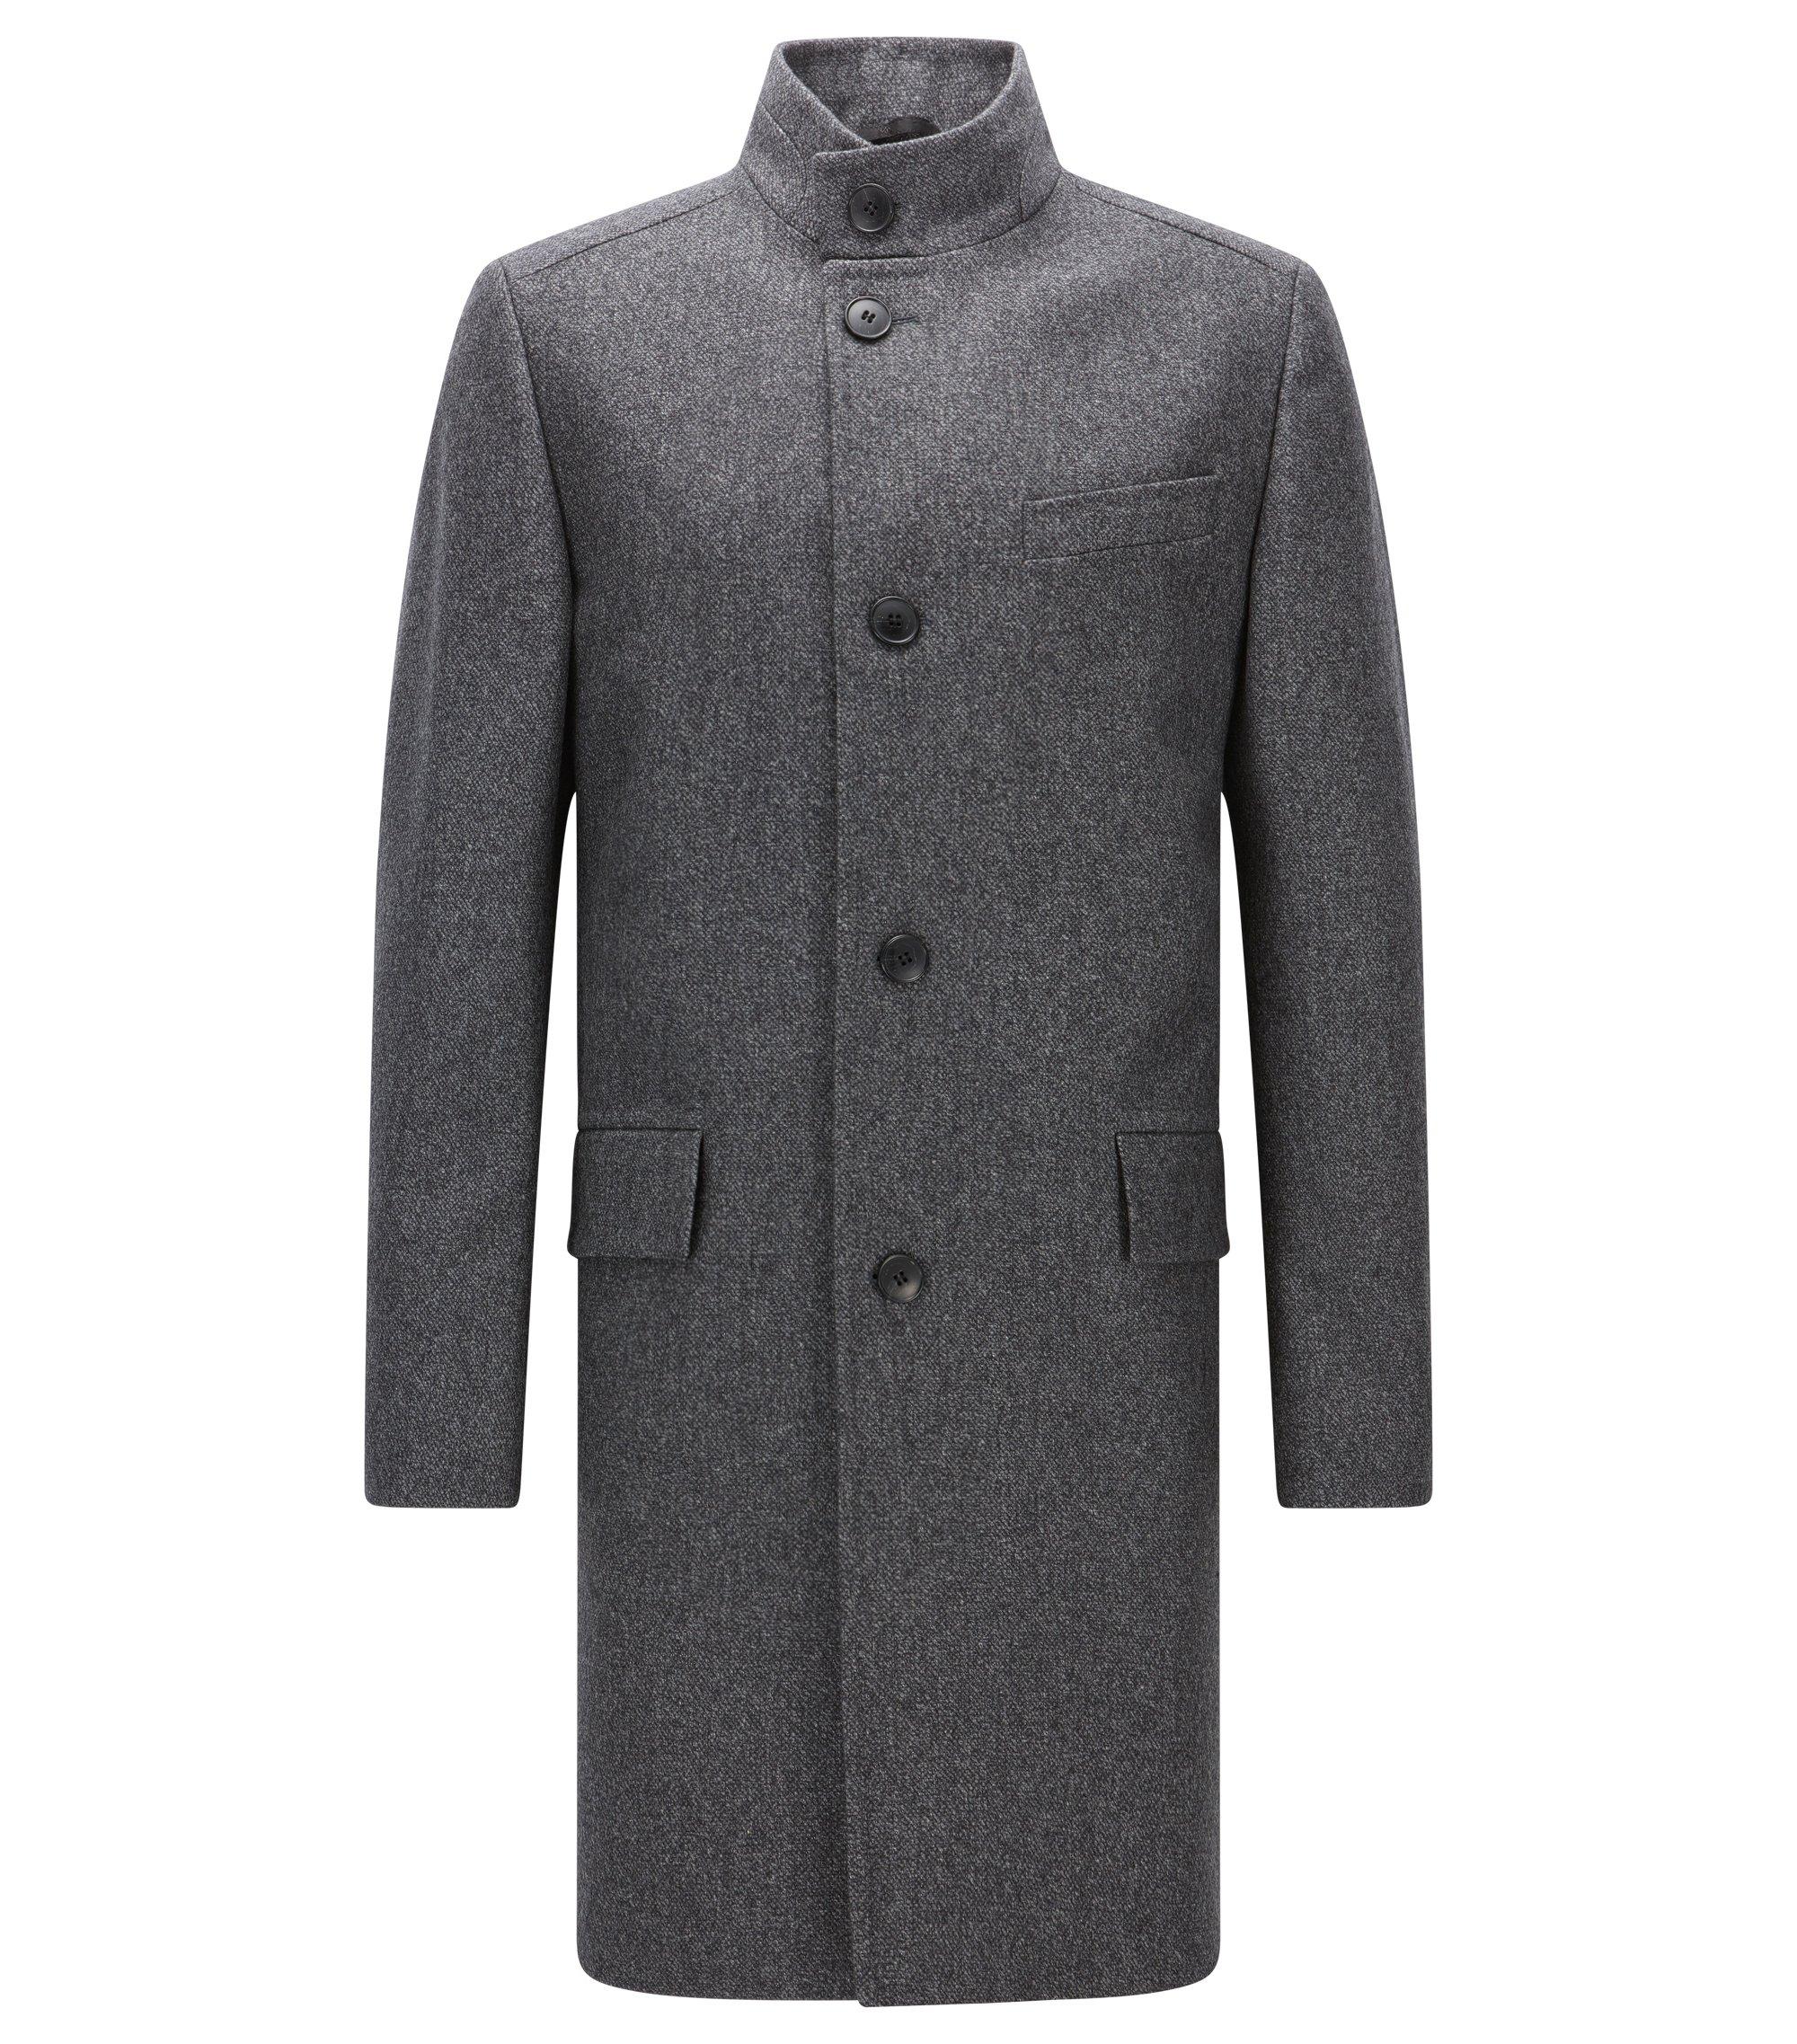 Cappotto regular fit in misto lana mélange, Grigio scuro